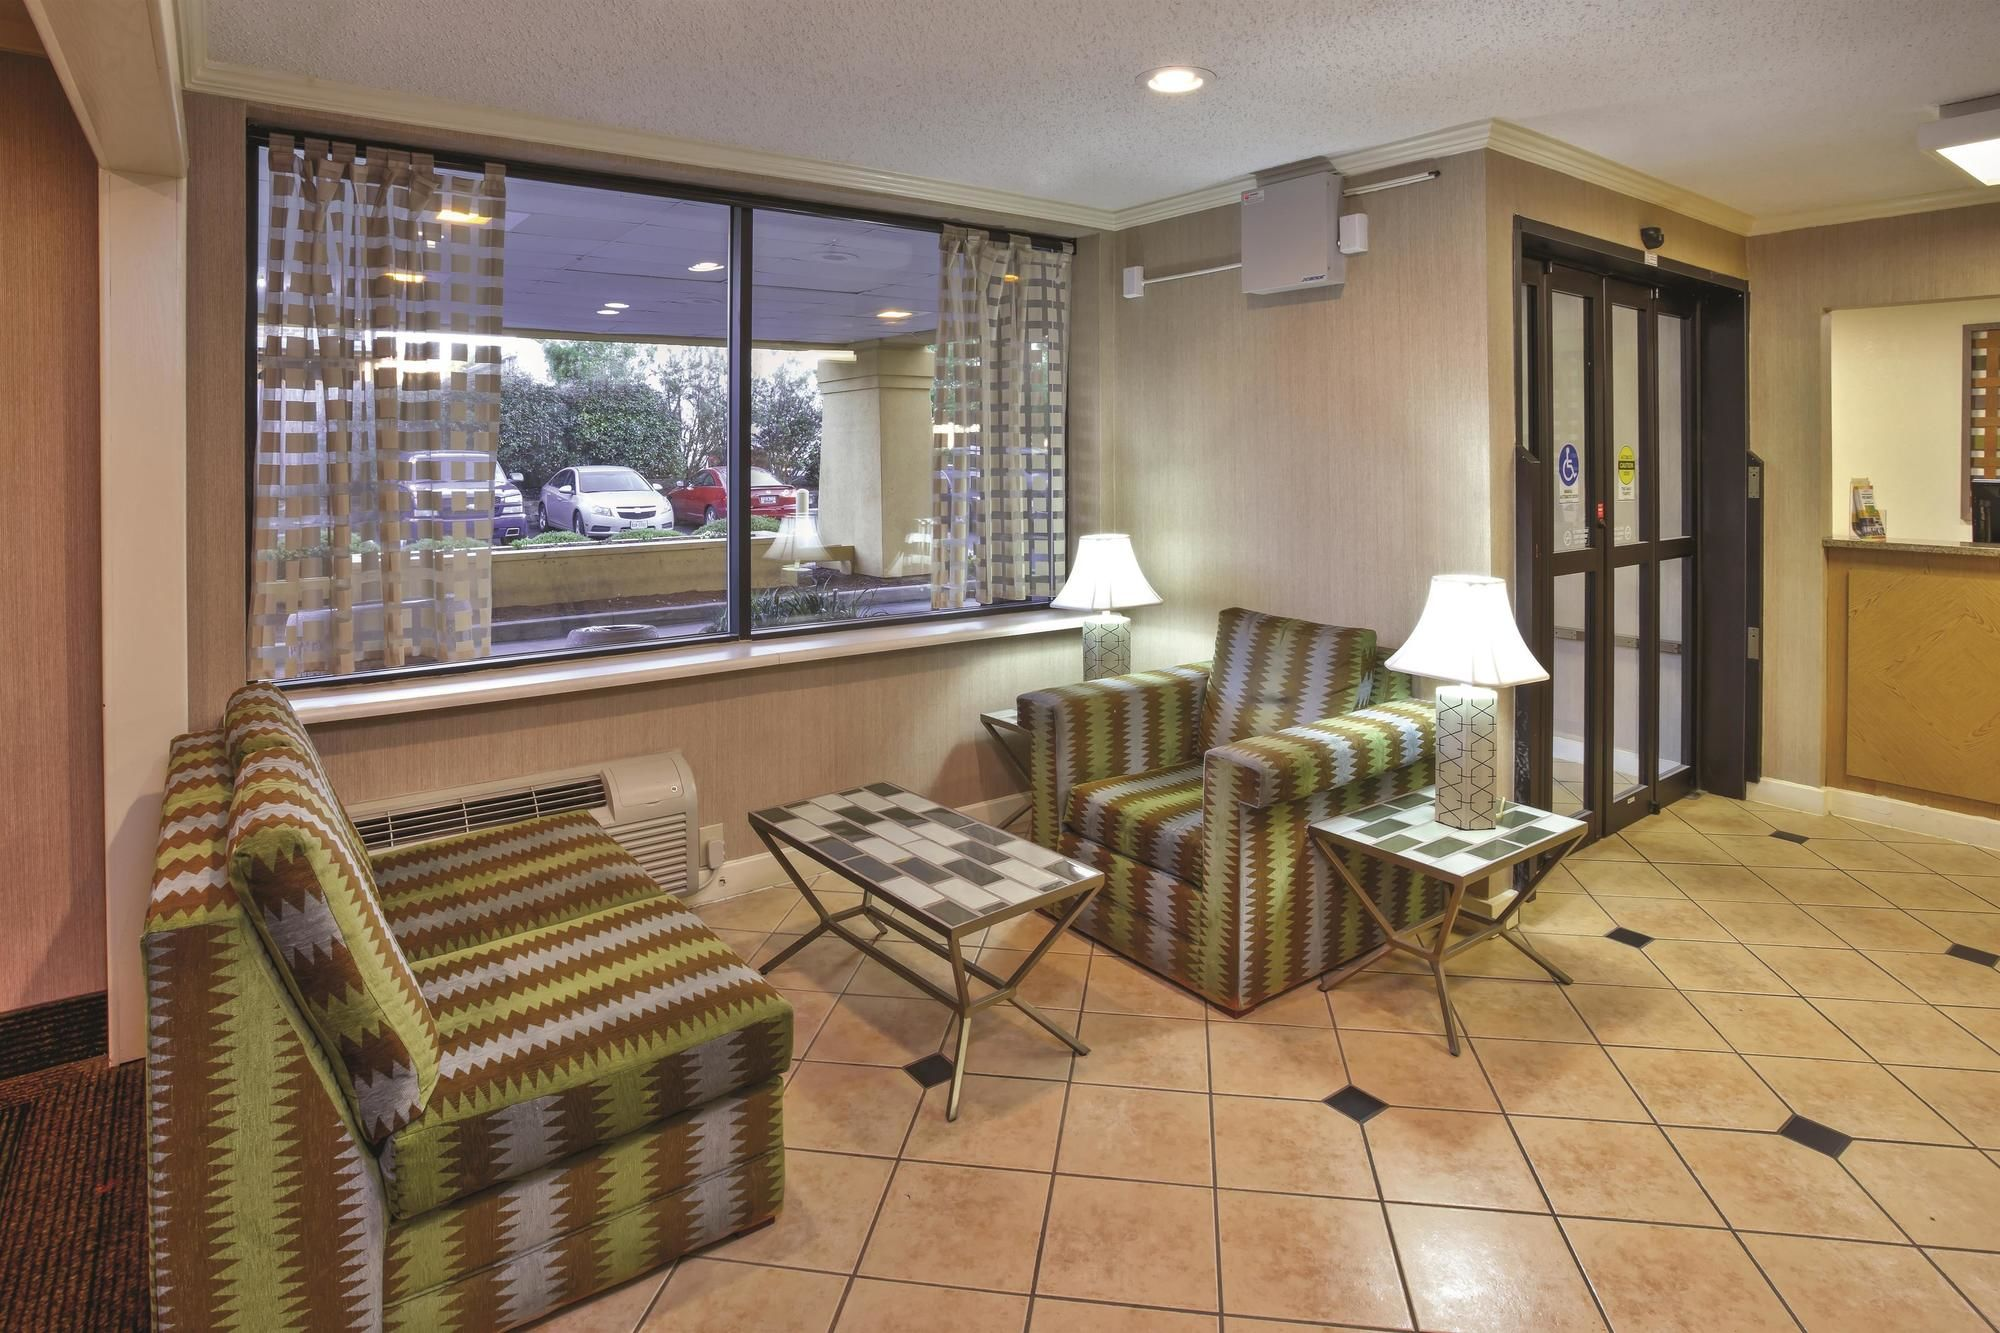 Birmingham Hotel Coupons for Birmingham, Alabama - FreeHotelCoupons.com